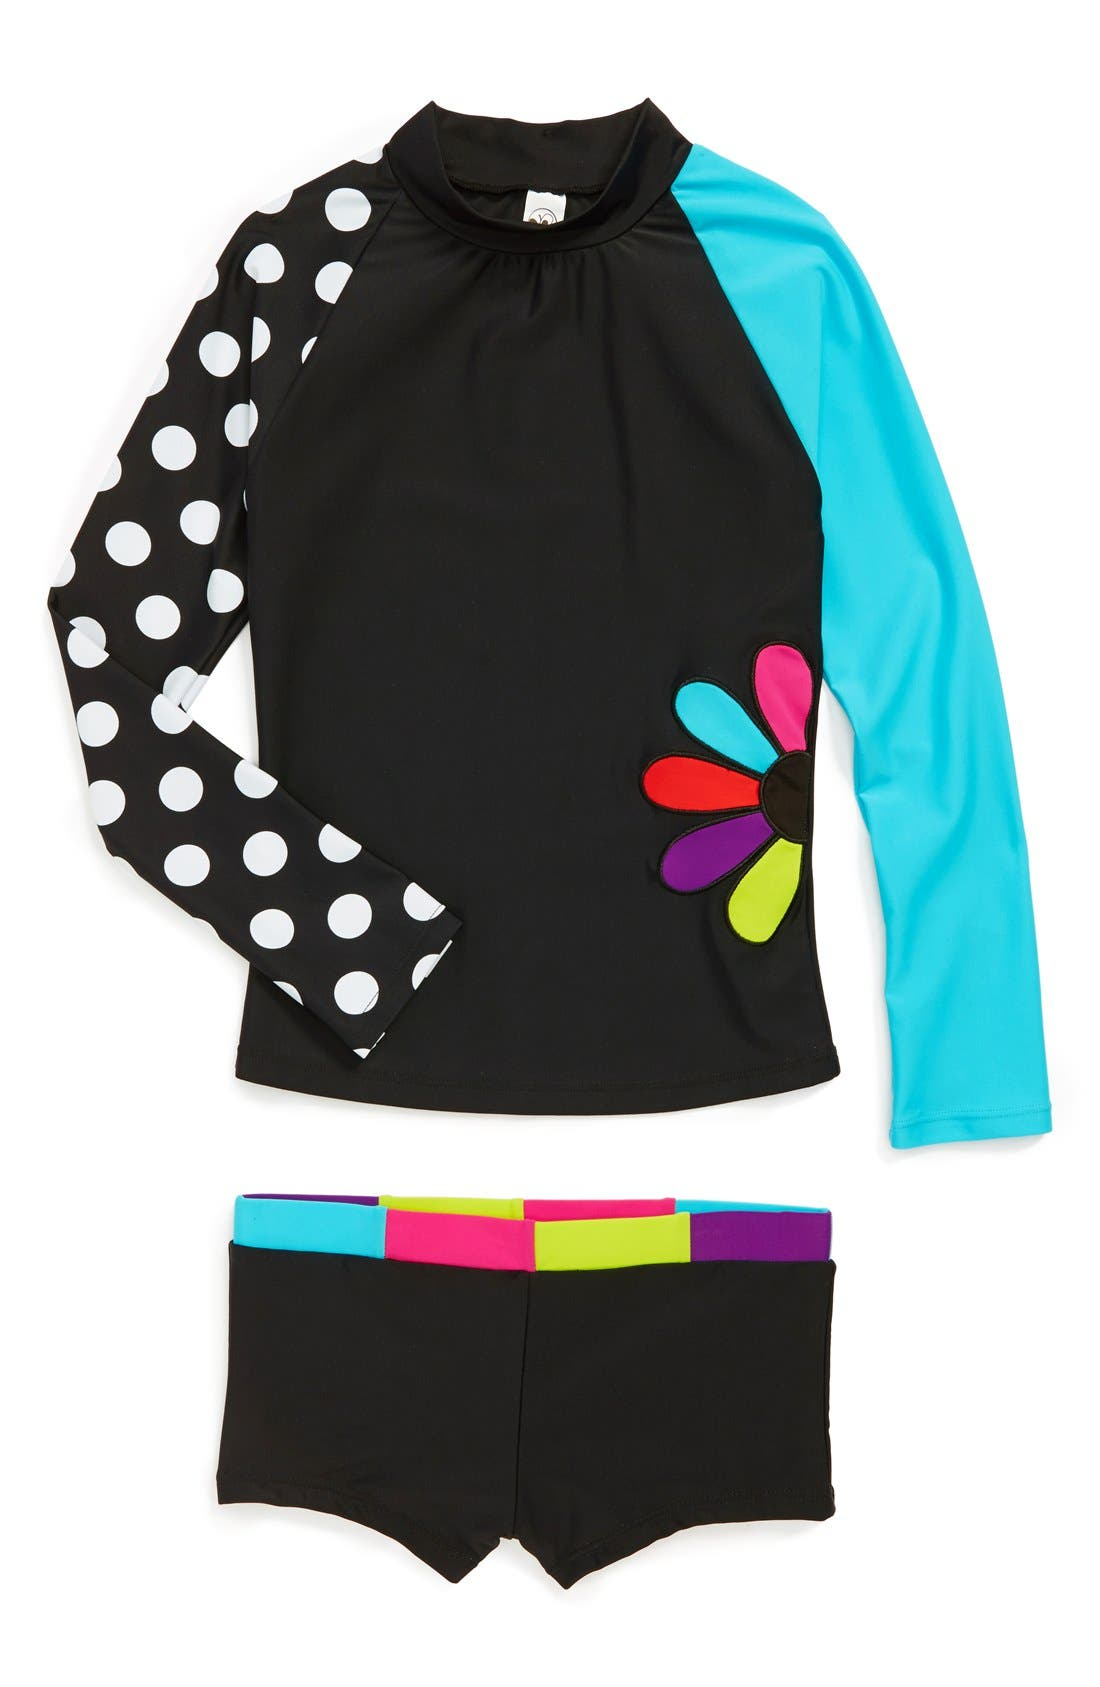 Main Image - Limeapple Two-Piece Rashguard Swimsuit (Little Girls & Big Girls)